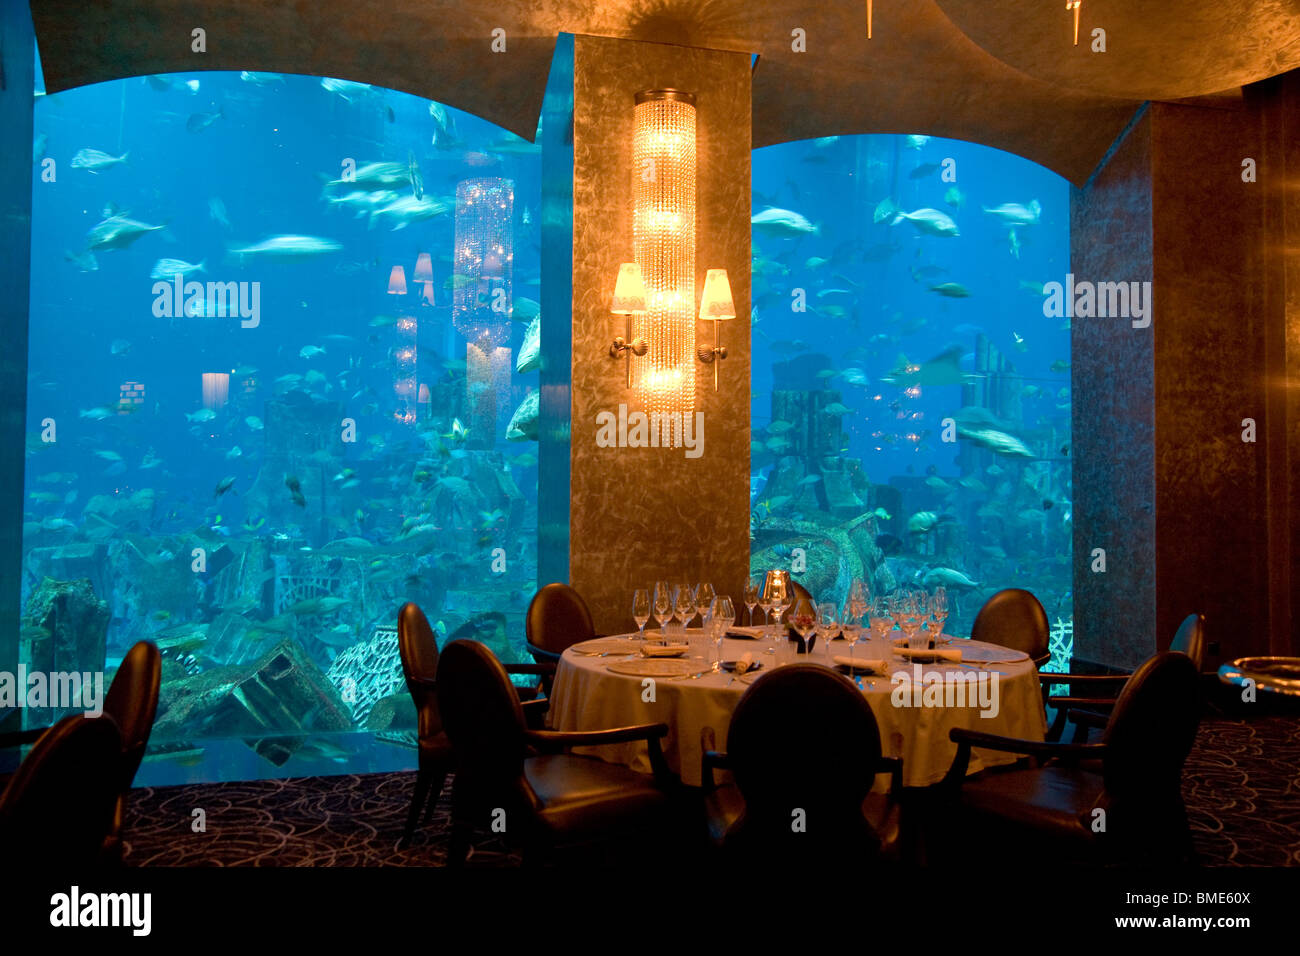 Atlantis Dubai Restaurant High Resolution Stock Photography And Images Alamy